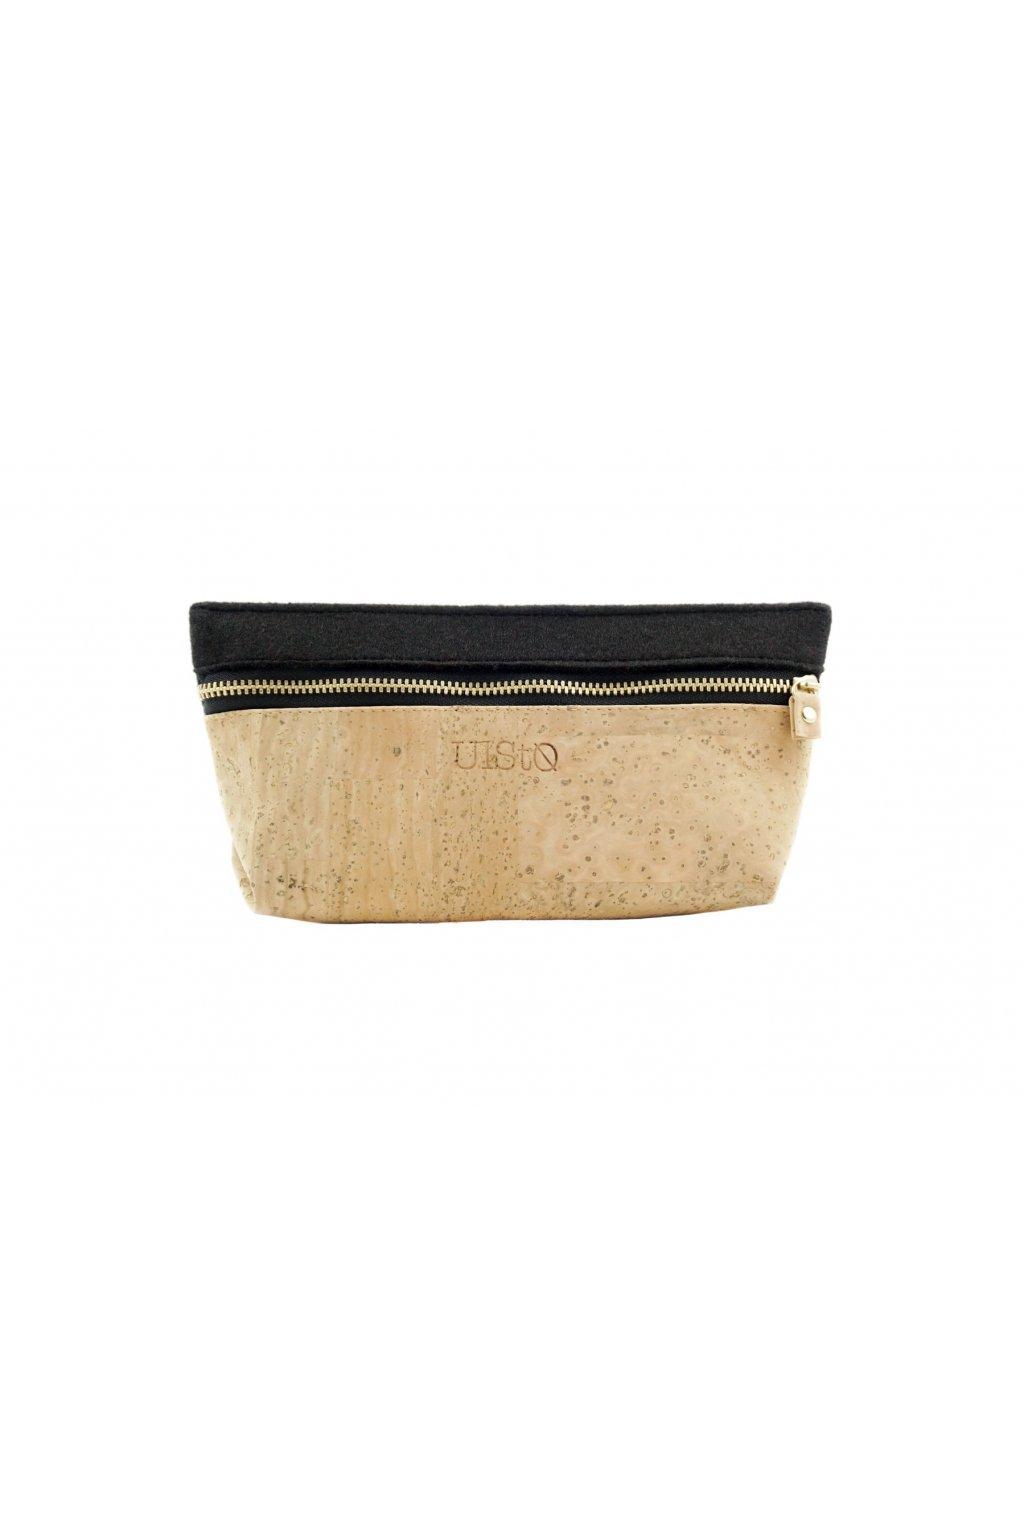 UlStO Taschen Accessoires Kork Filz 34 1800x1199